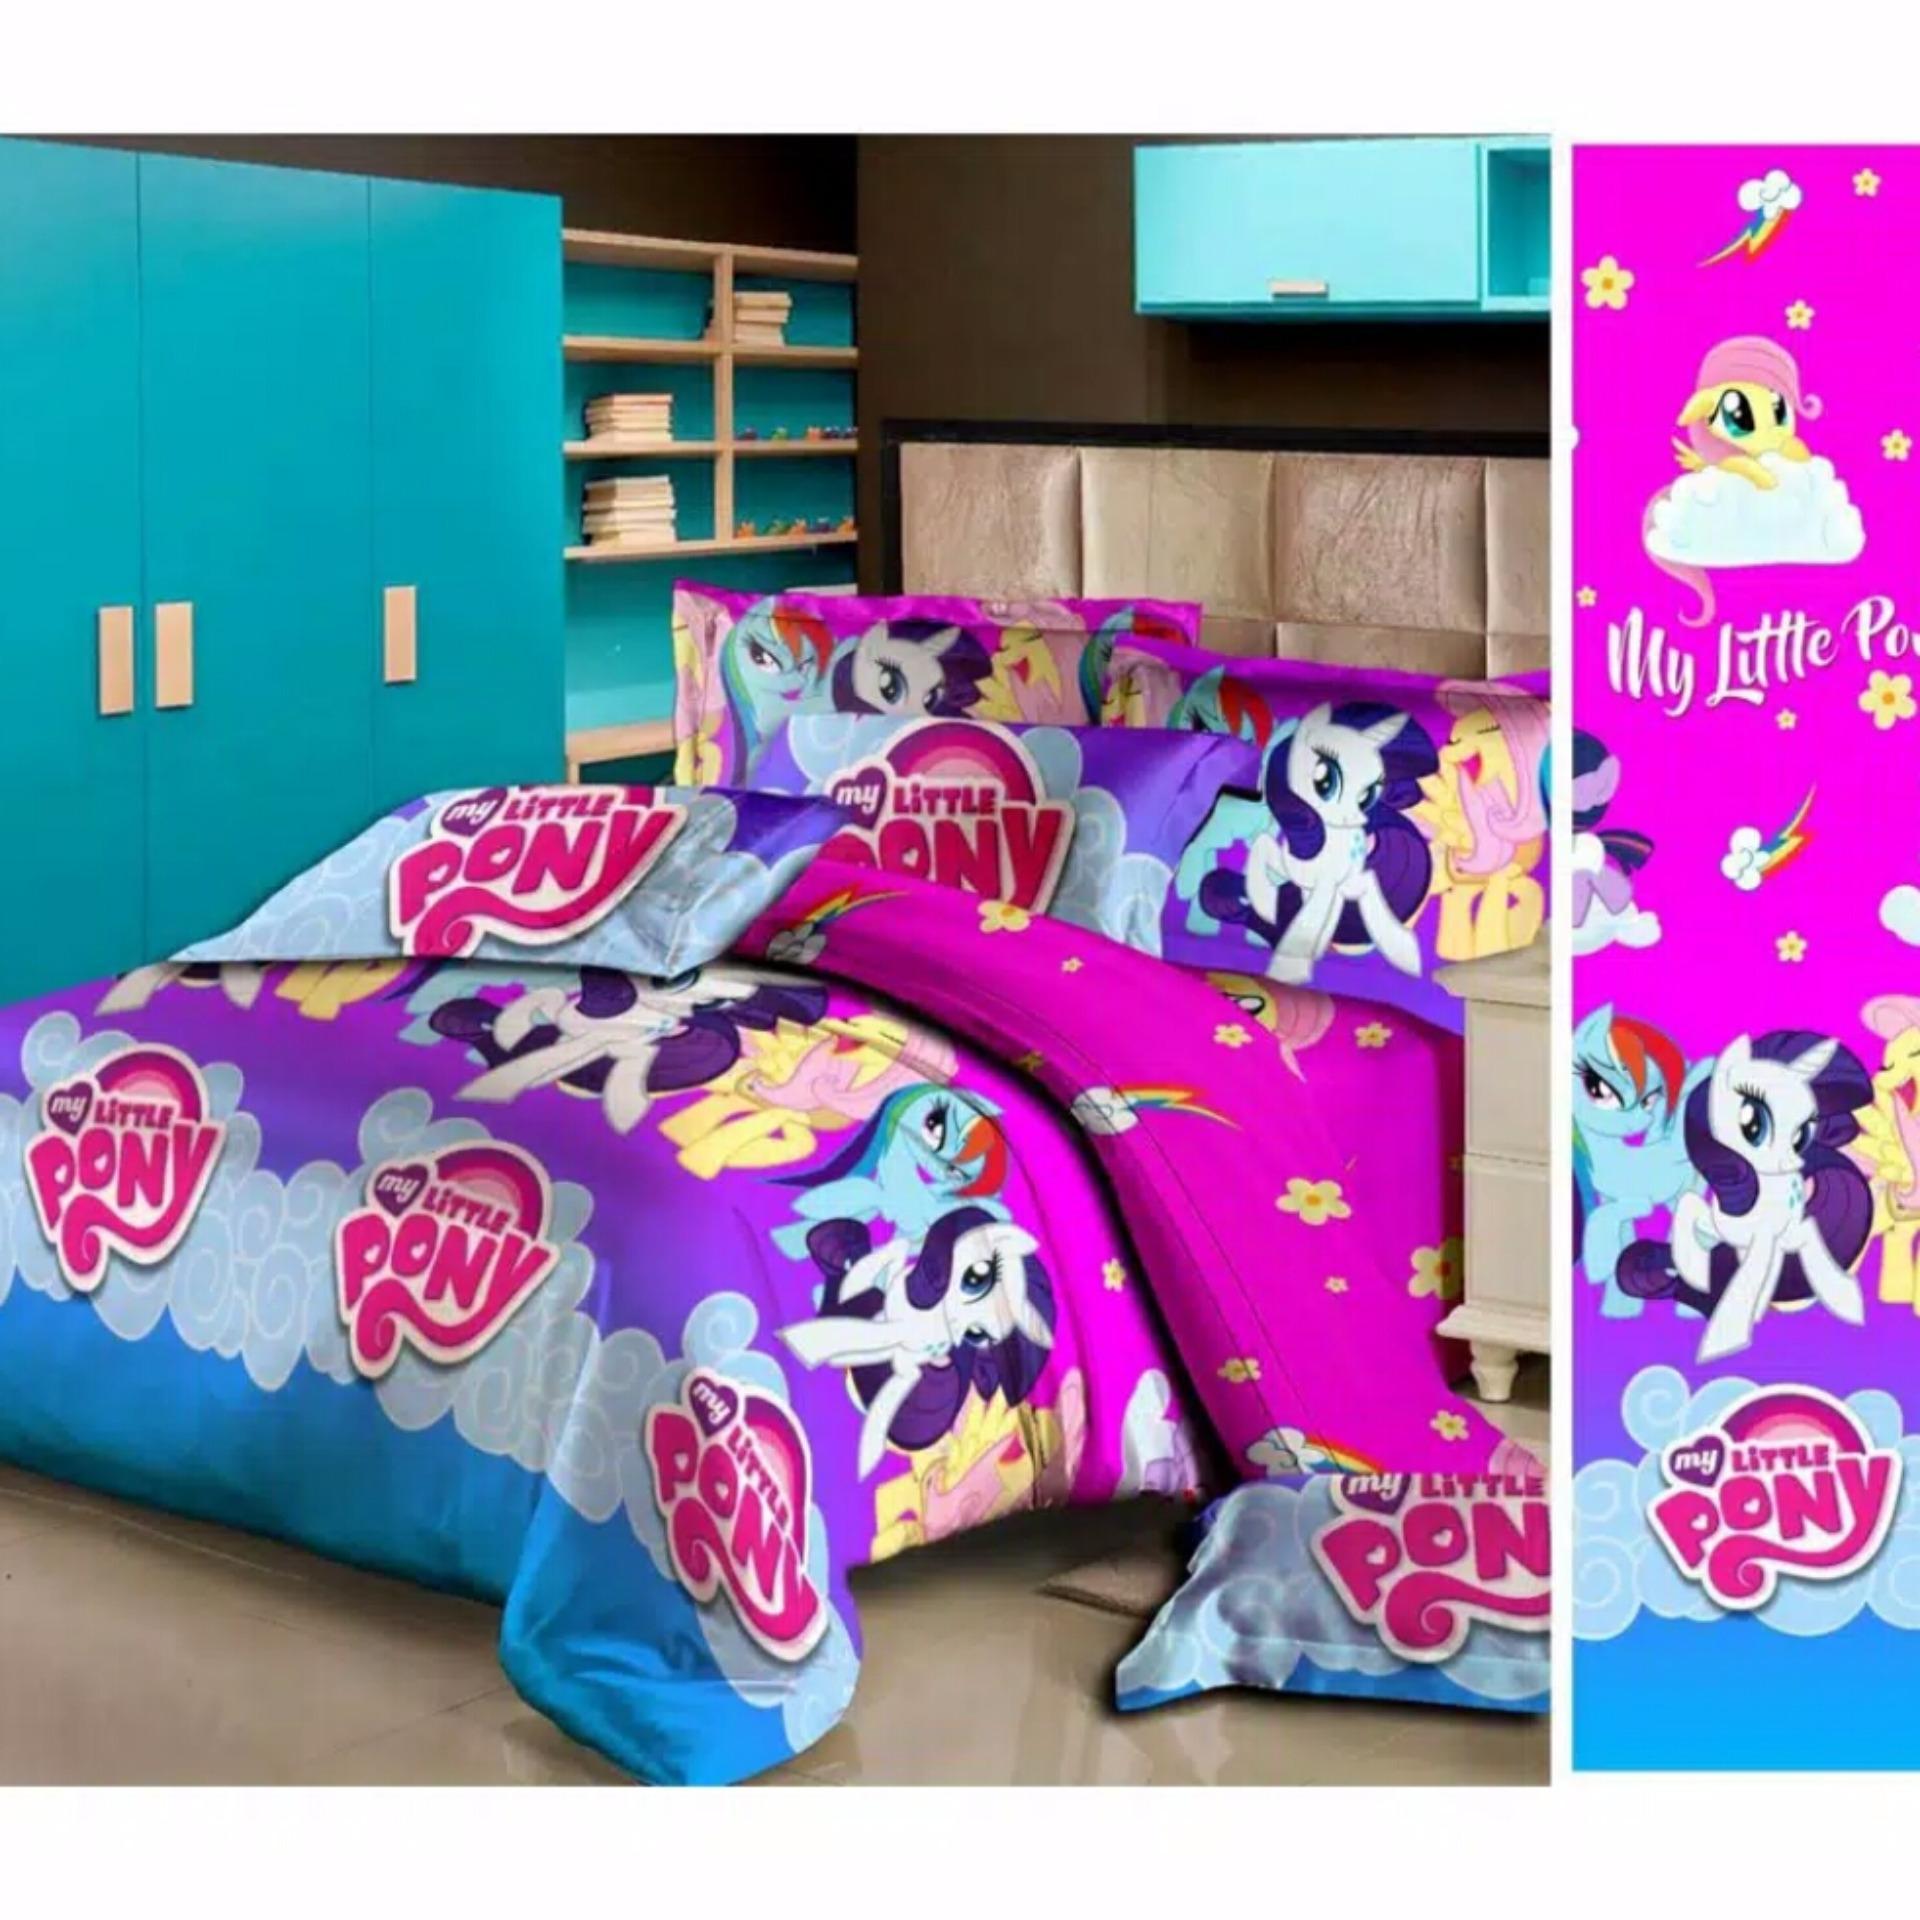 Beli Sprei Fata Single 120 X 200 Little Pony Fata Dengan Harga Terjangkau